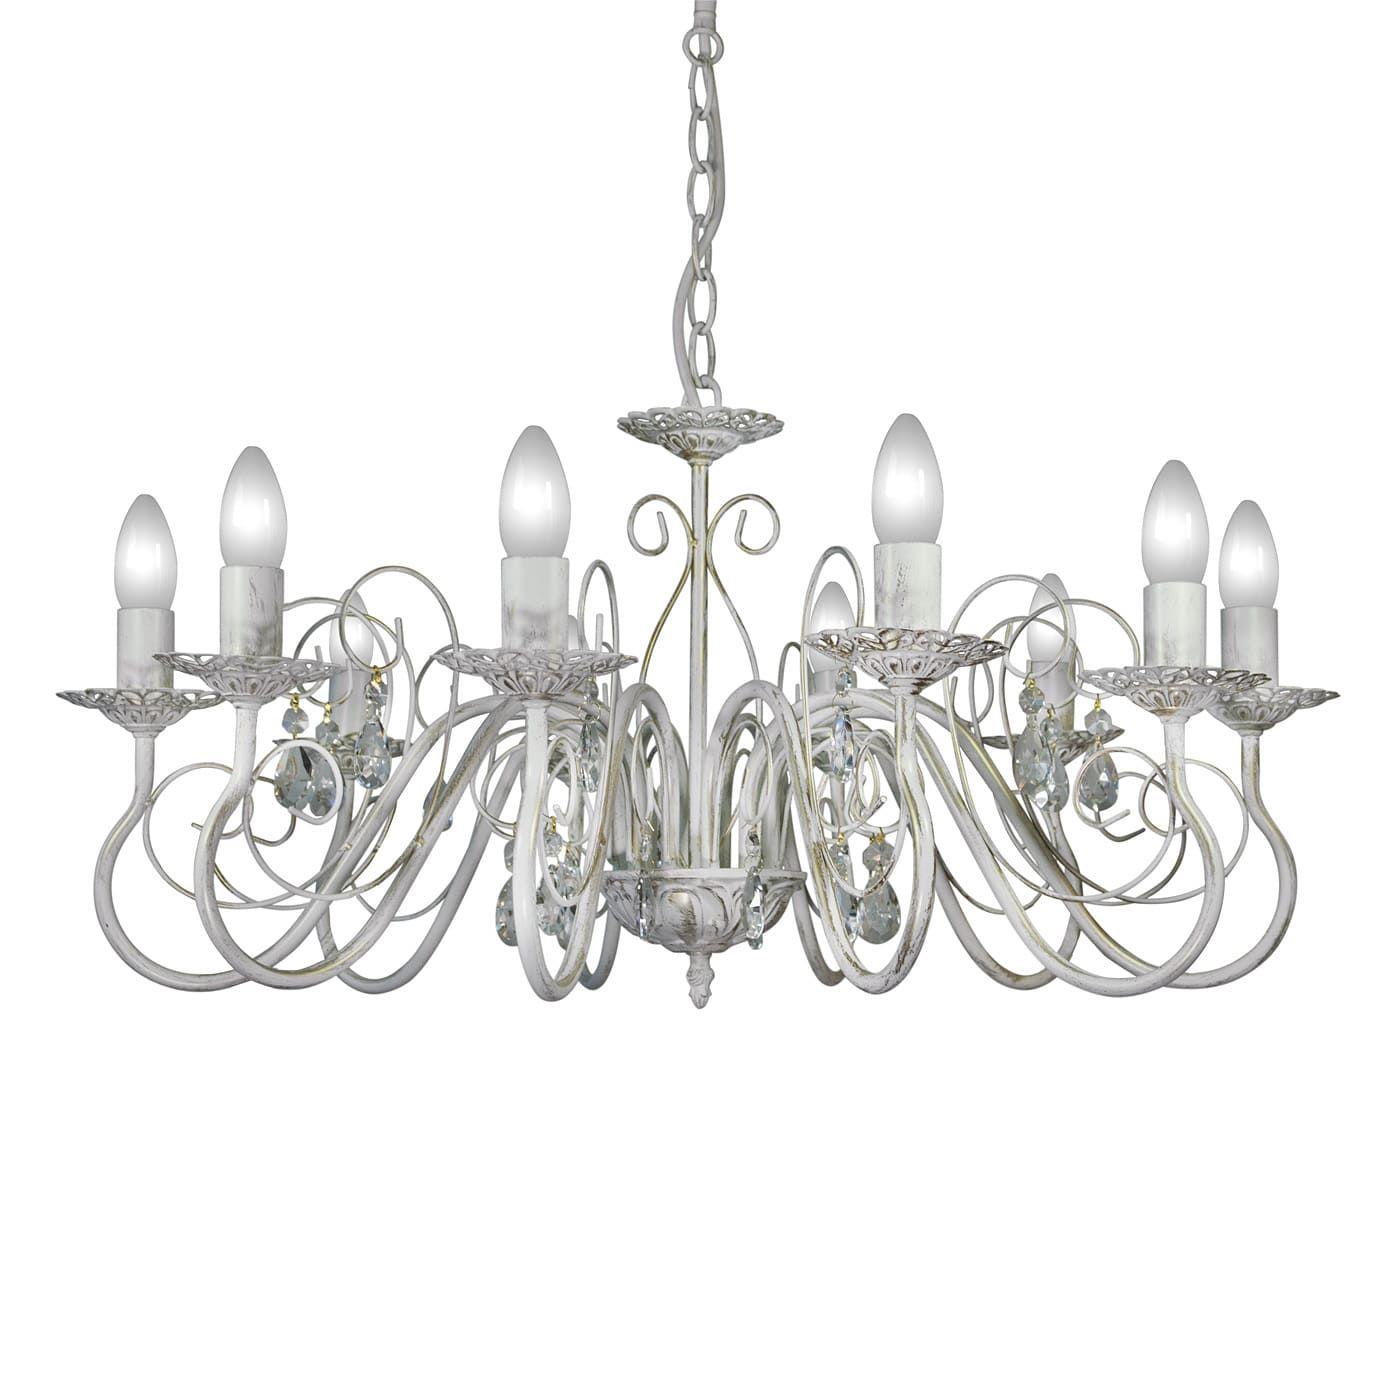 PETRASVET / Pendant chandelier S1161-10, 10xE14 max. 60W